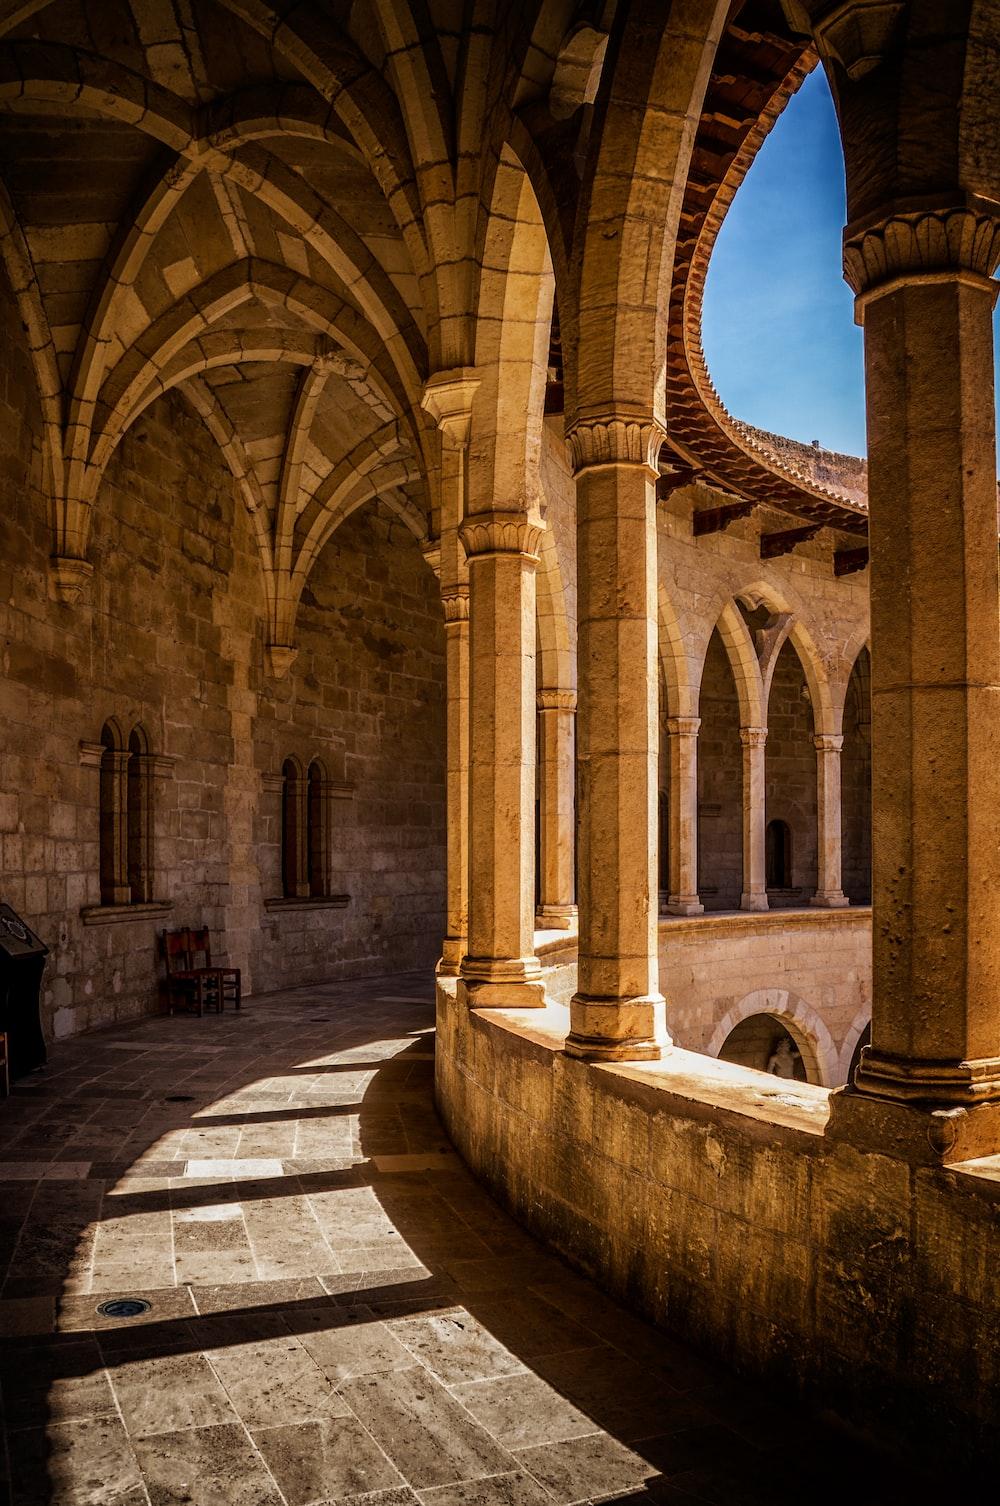 brown concrete pillars